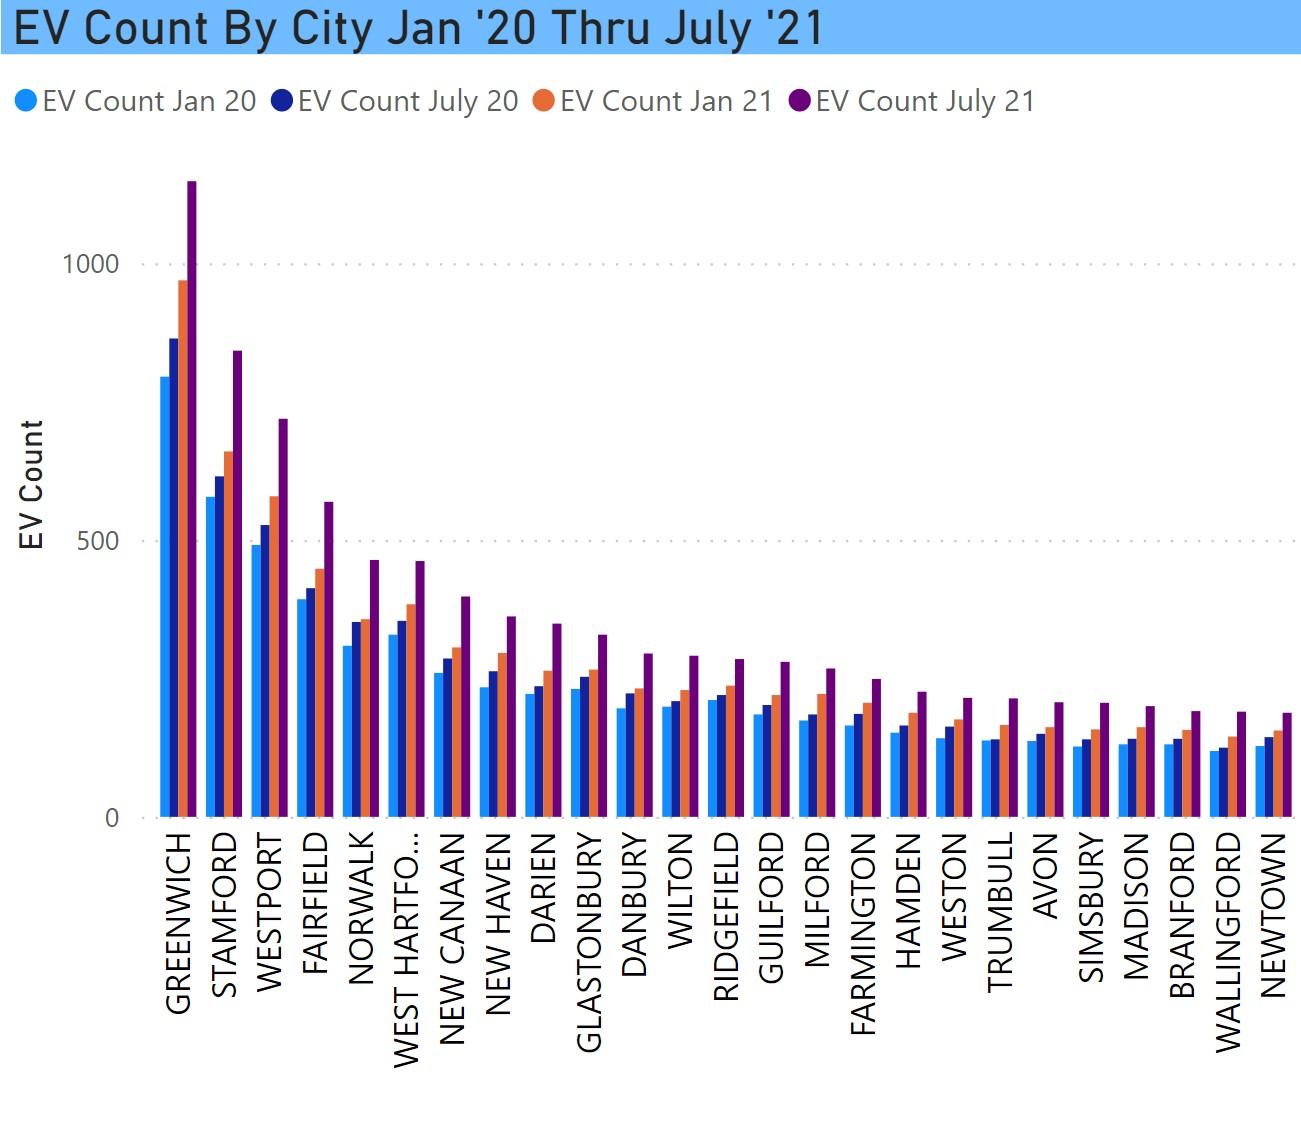 EV trend by city